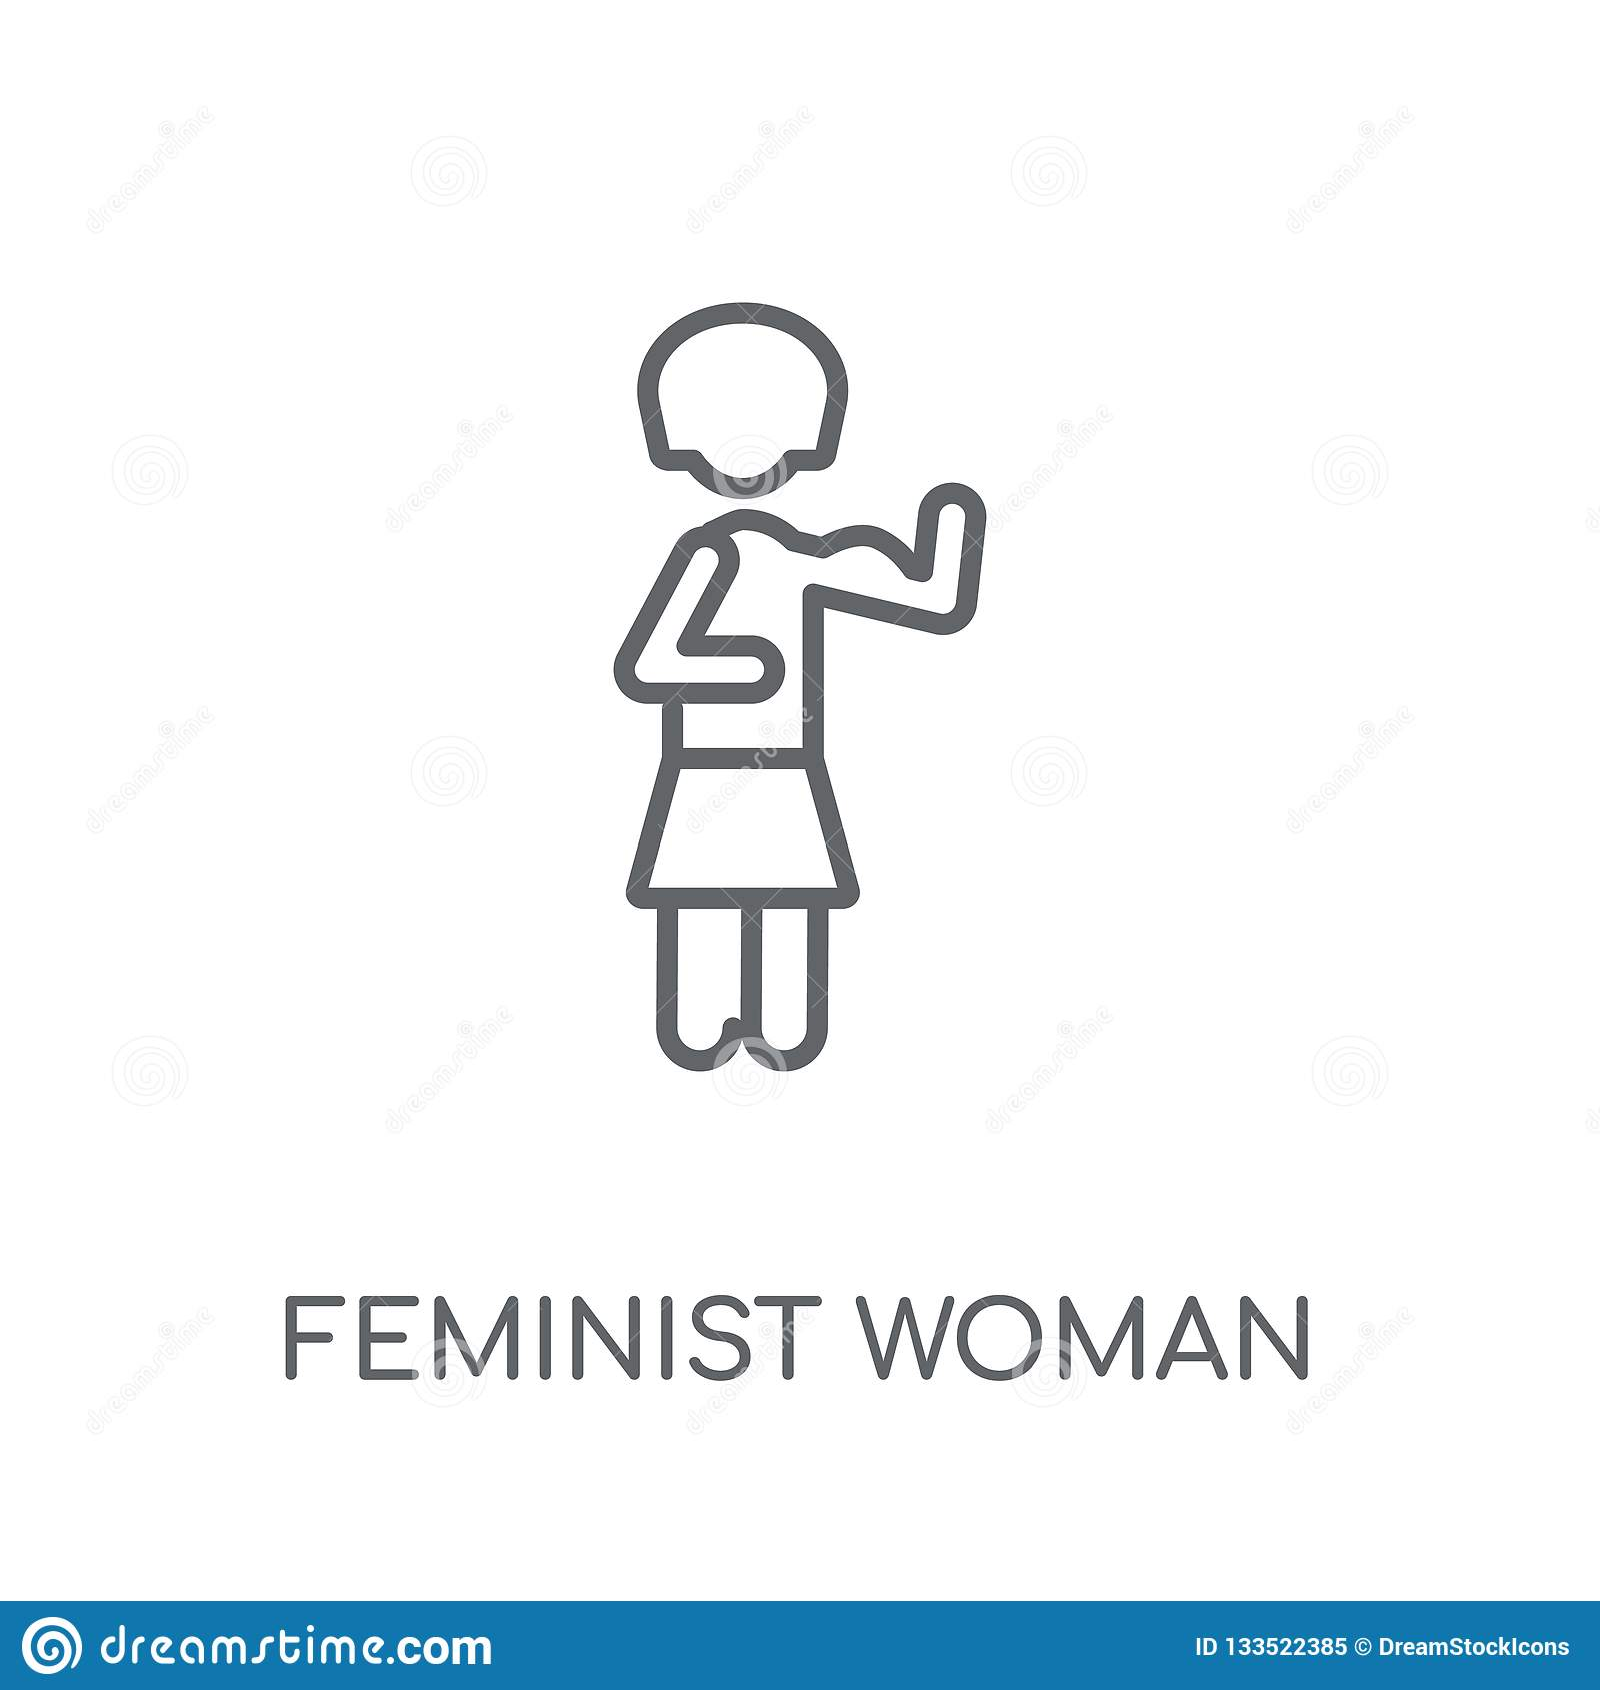 feminist woman linear icon